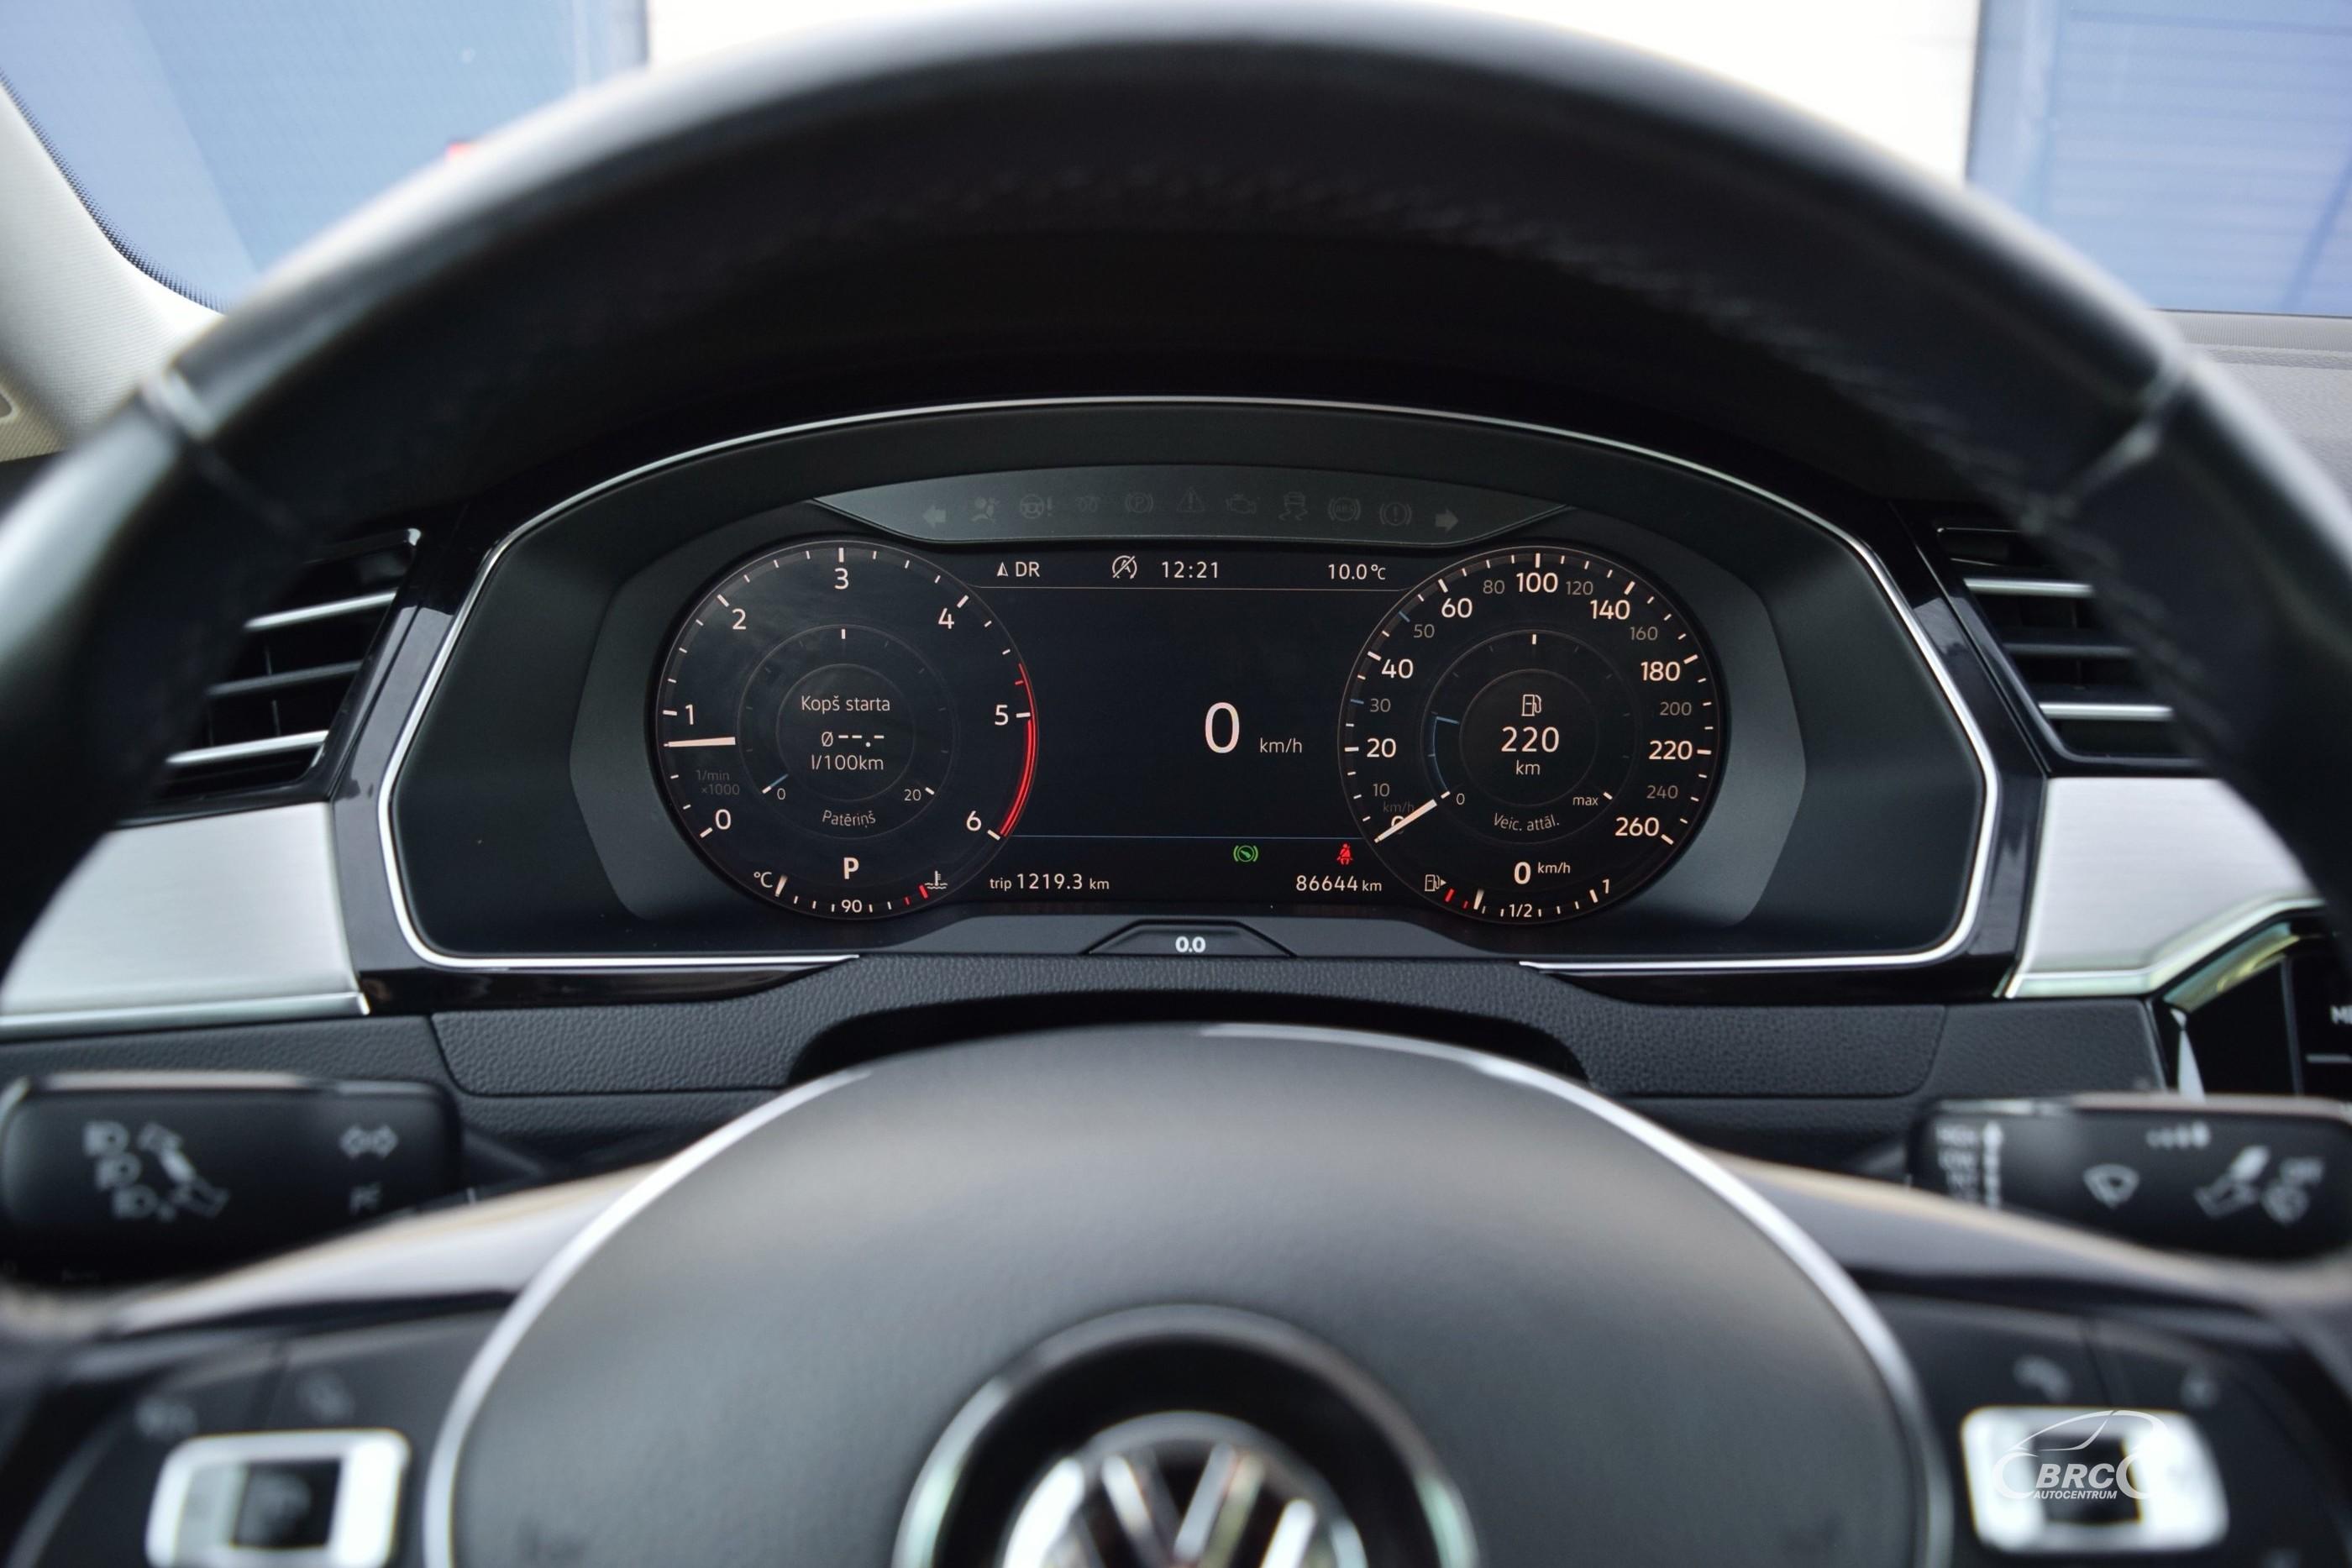 Volkswagen Passat Limousine R-Line DSG